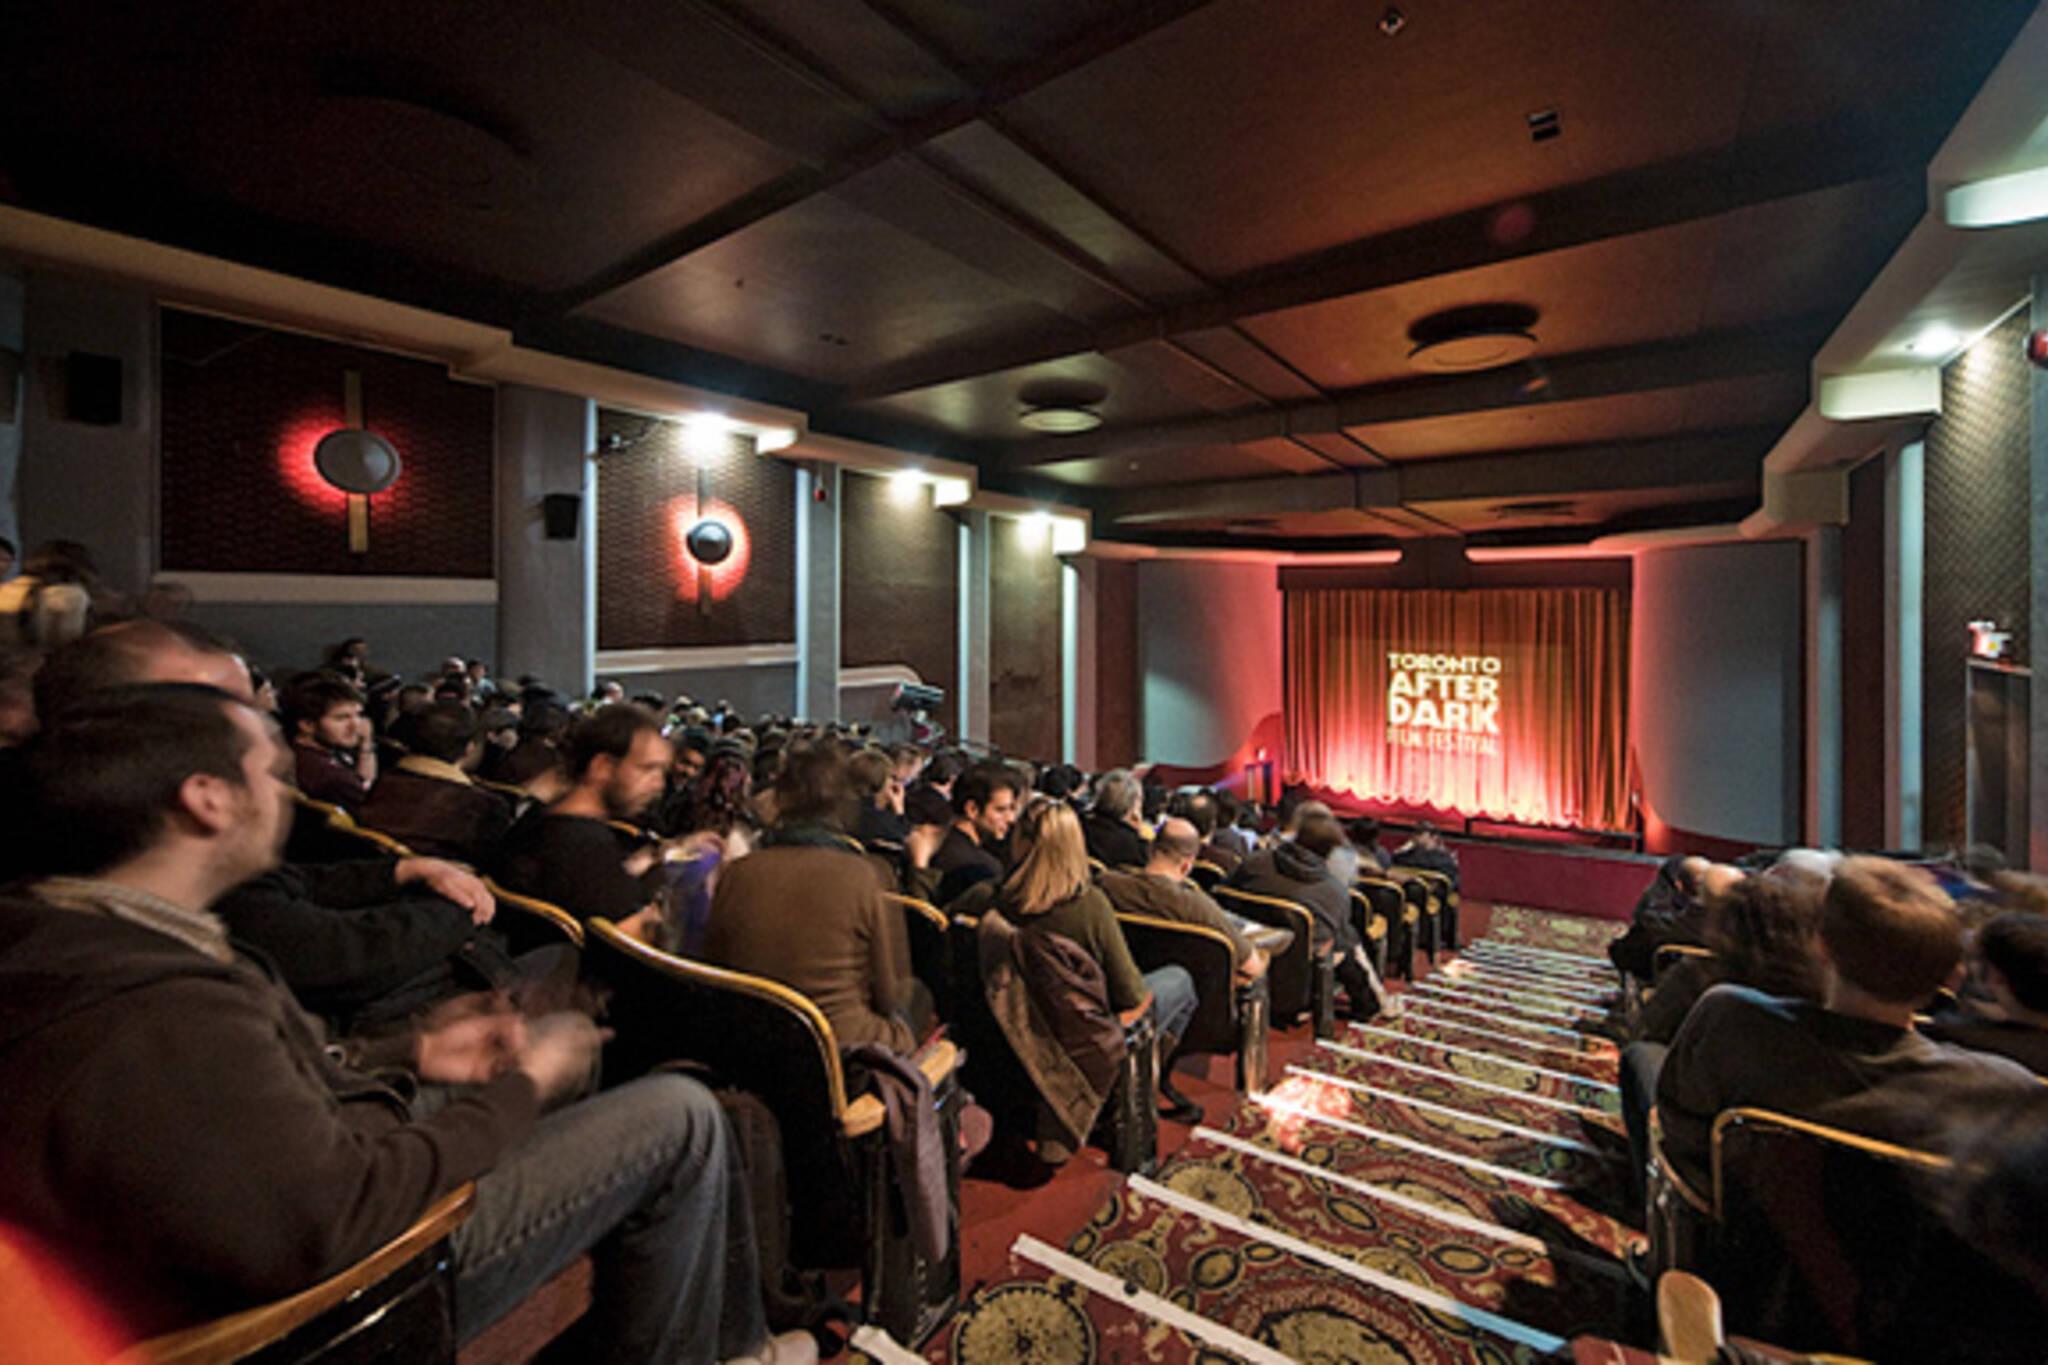 The Best Film Festivals in Toronto